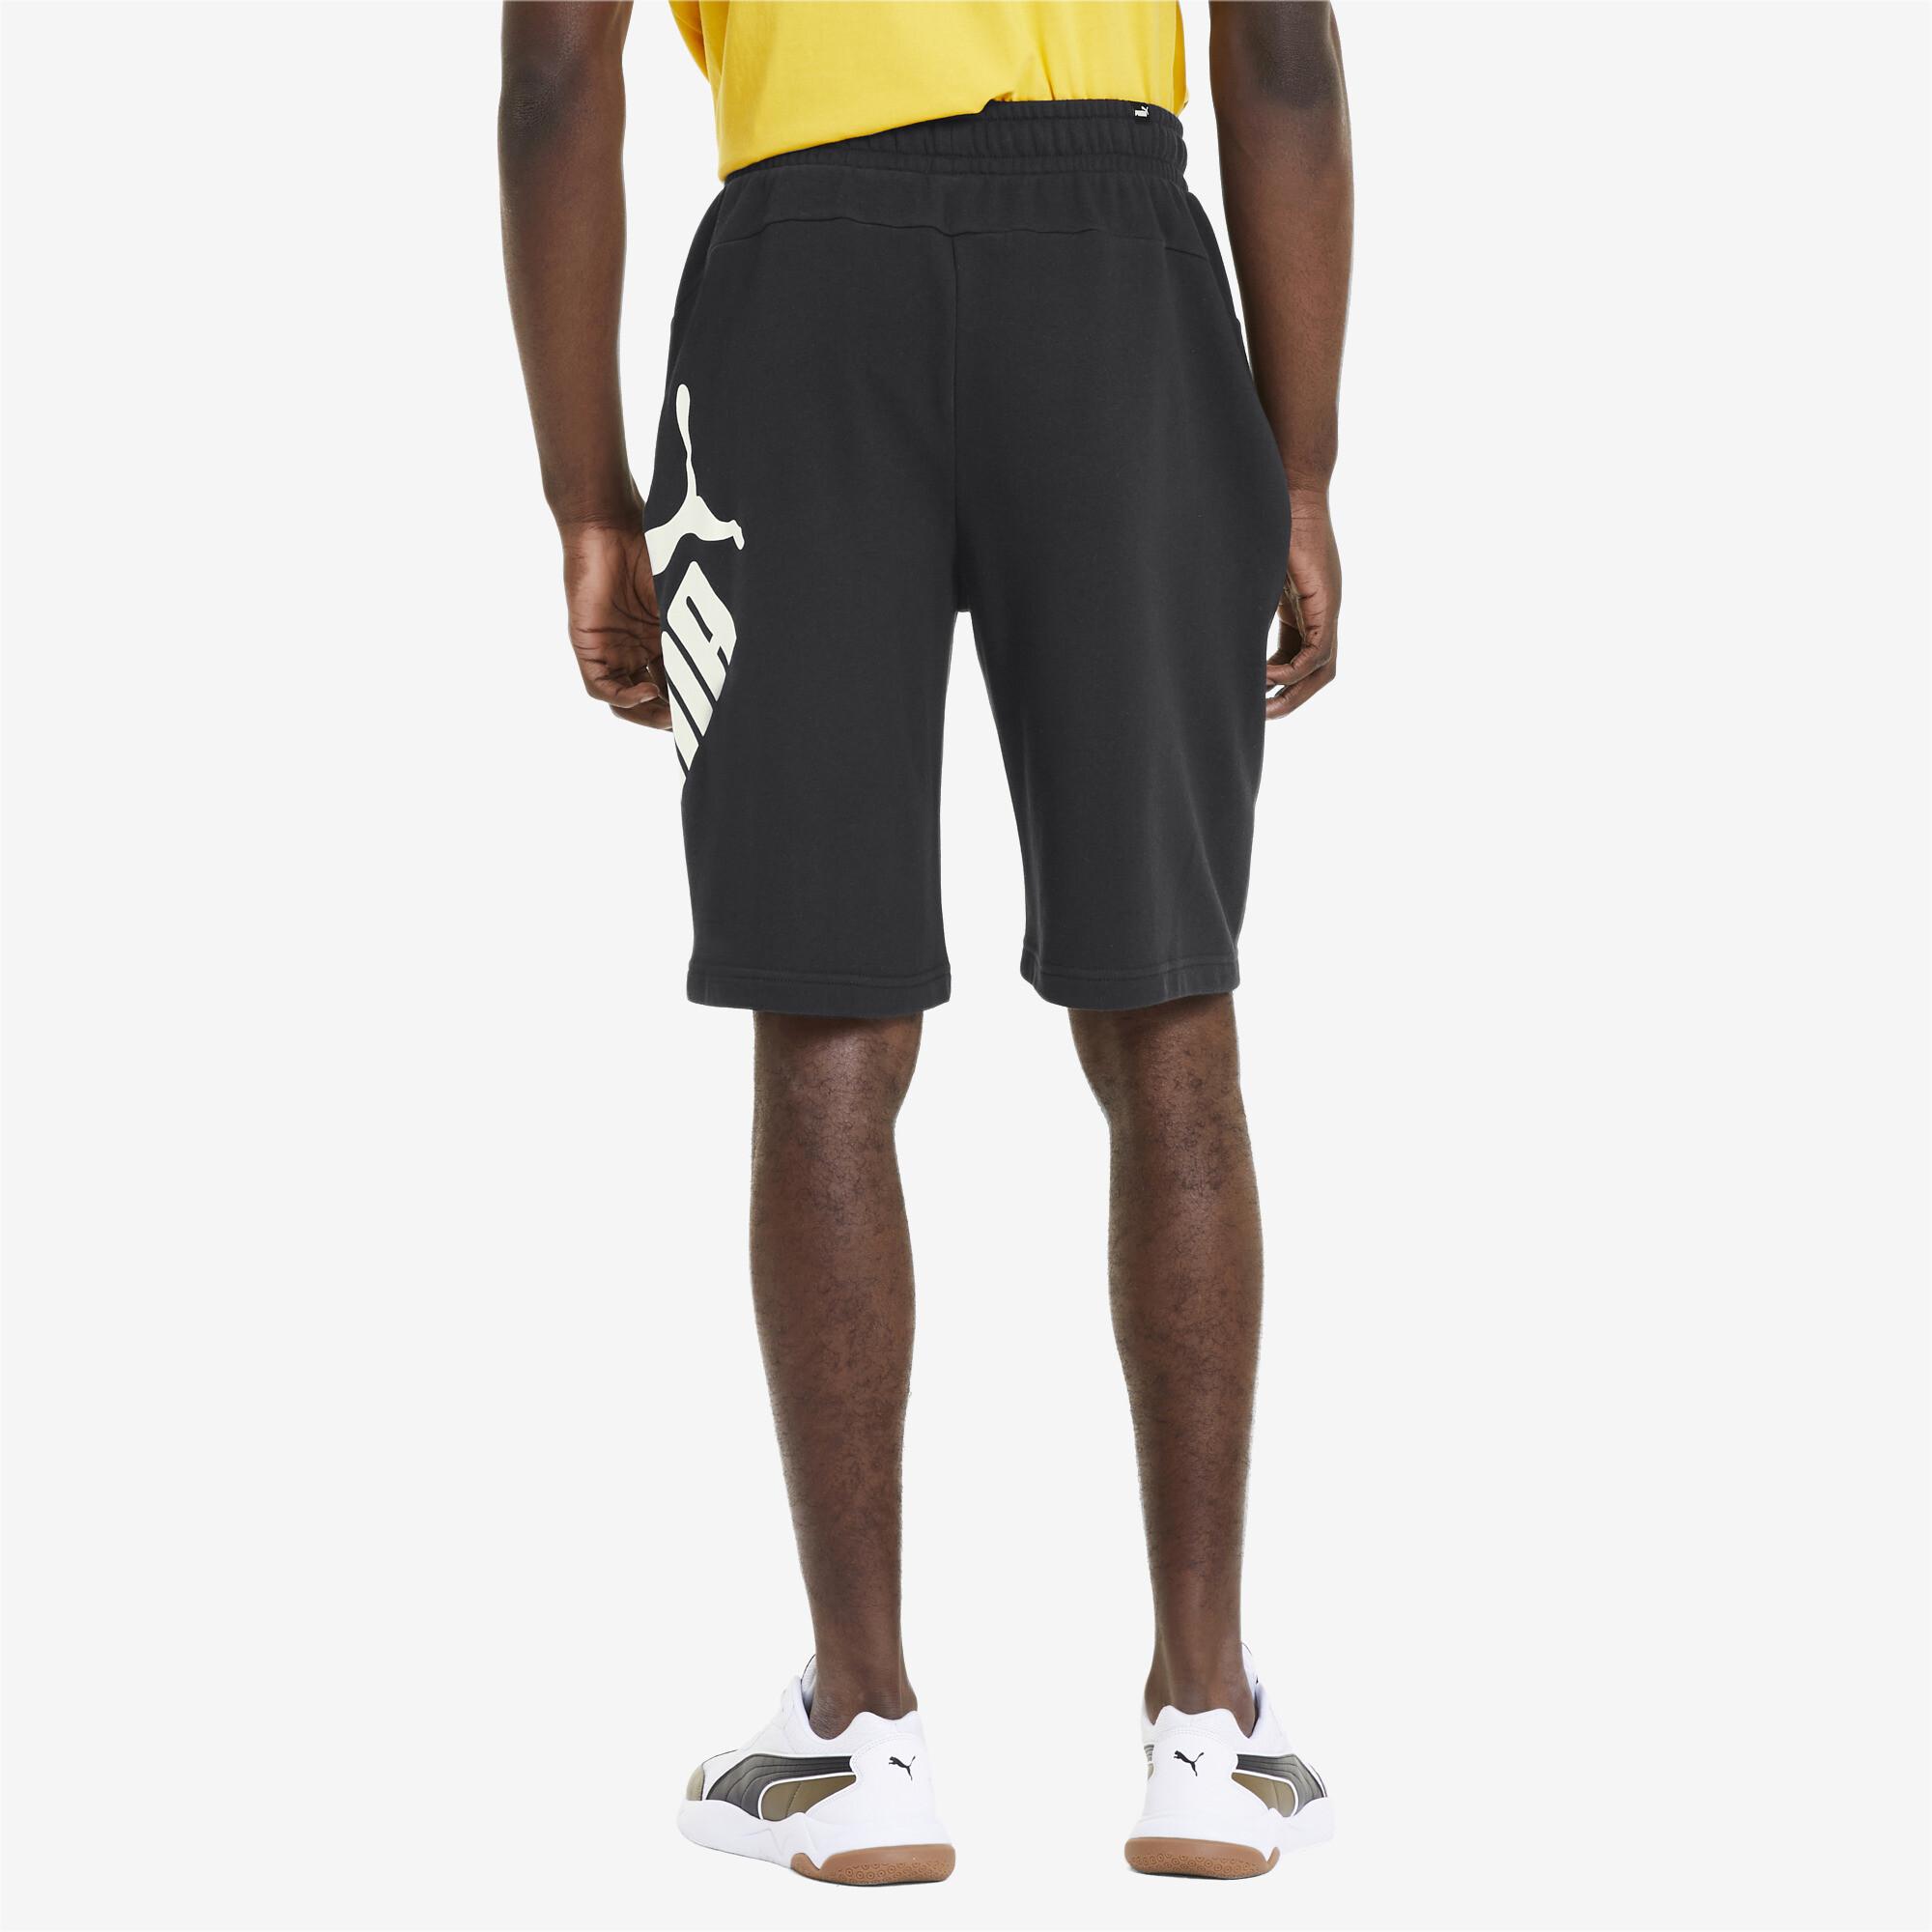 PUMA-Big-Logo-Men-039-s-Shorts-Men-Knitted-Shorts-Basics thumbnail 5